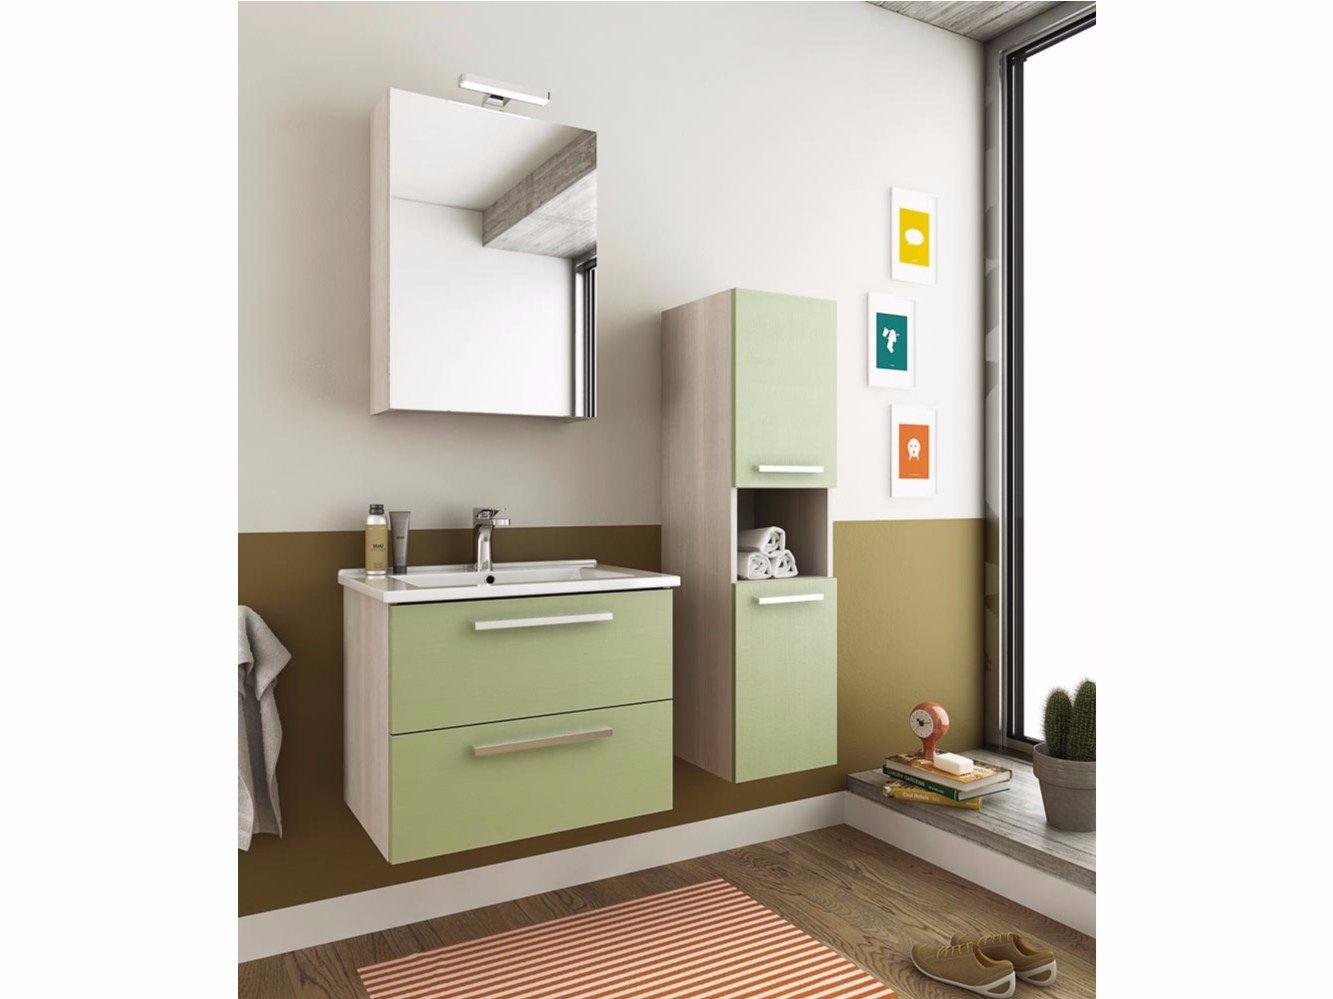 Mobile lavabo sospeso con cassetti harlem h2 by legnobagno - Lavabo sospeso con mobile ...